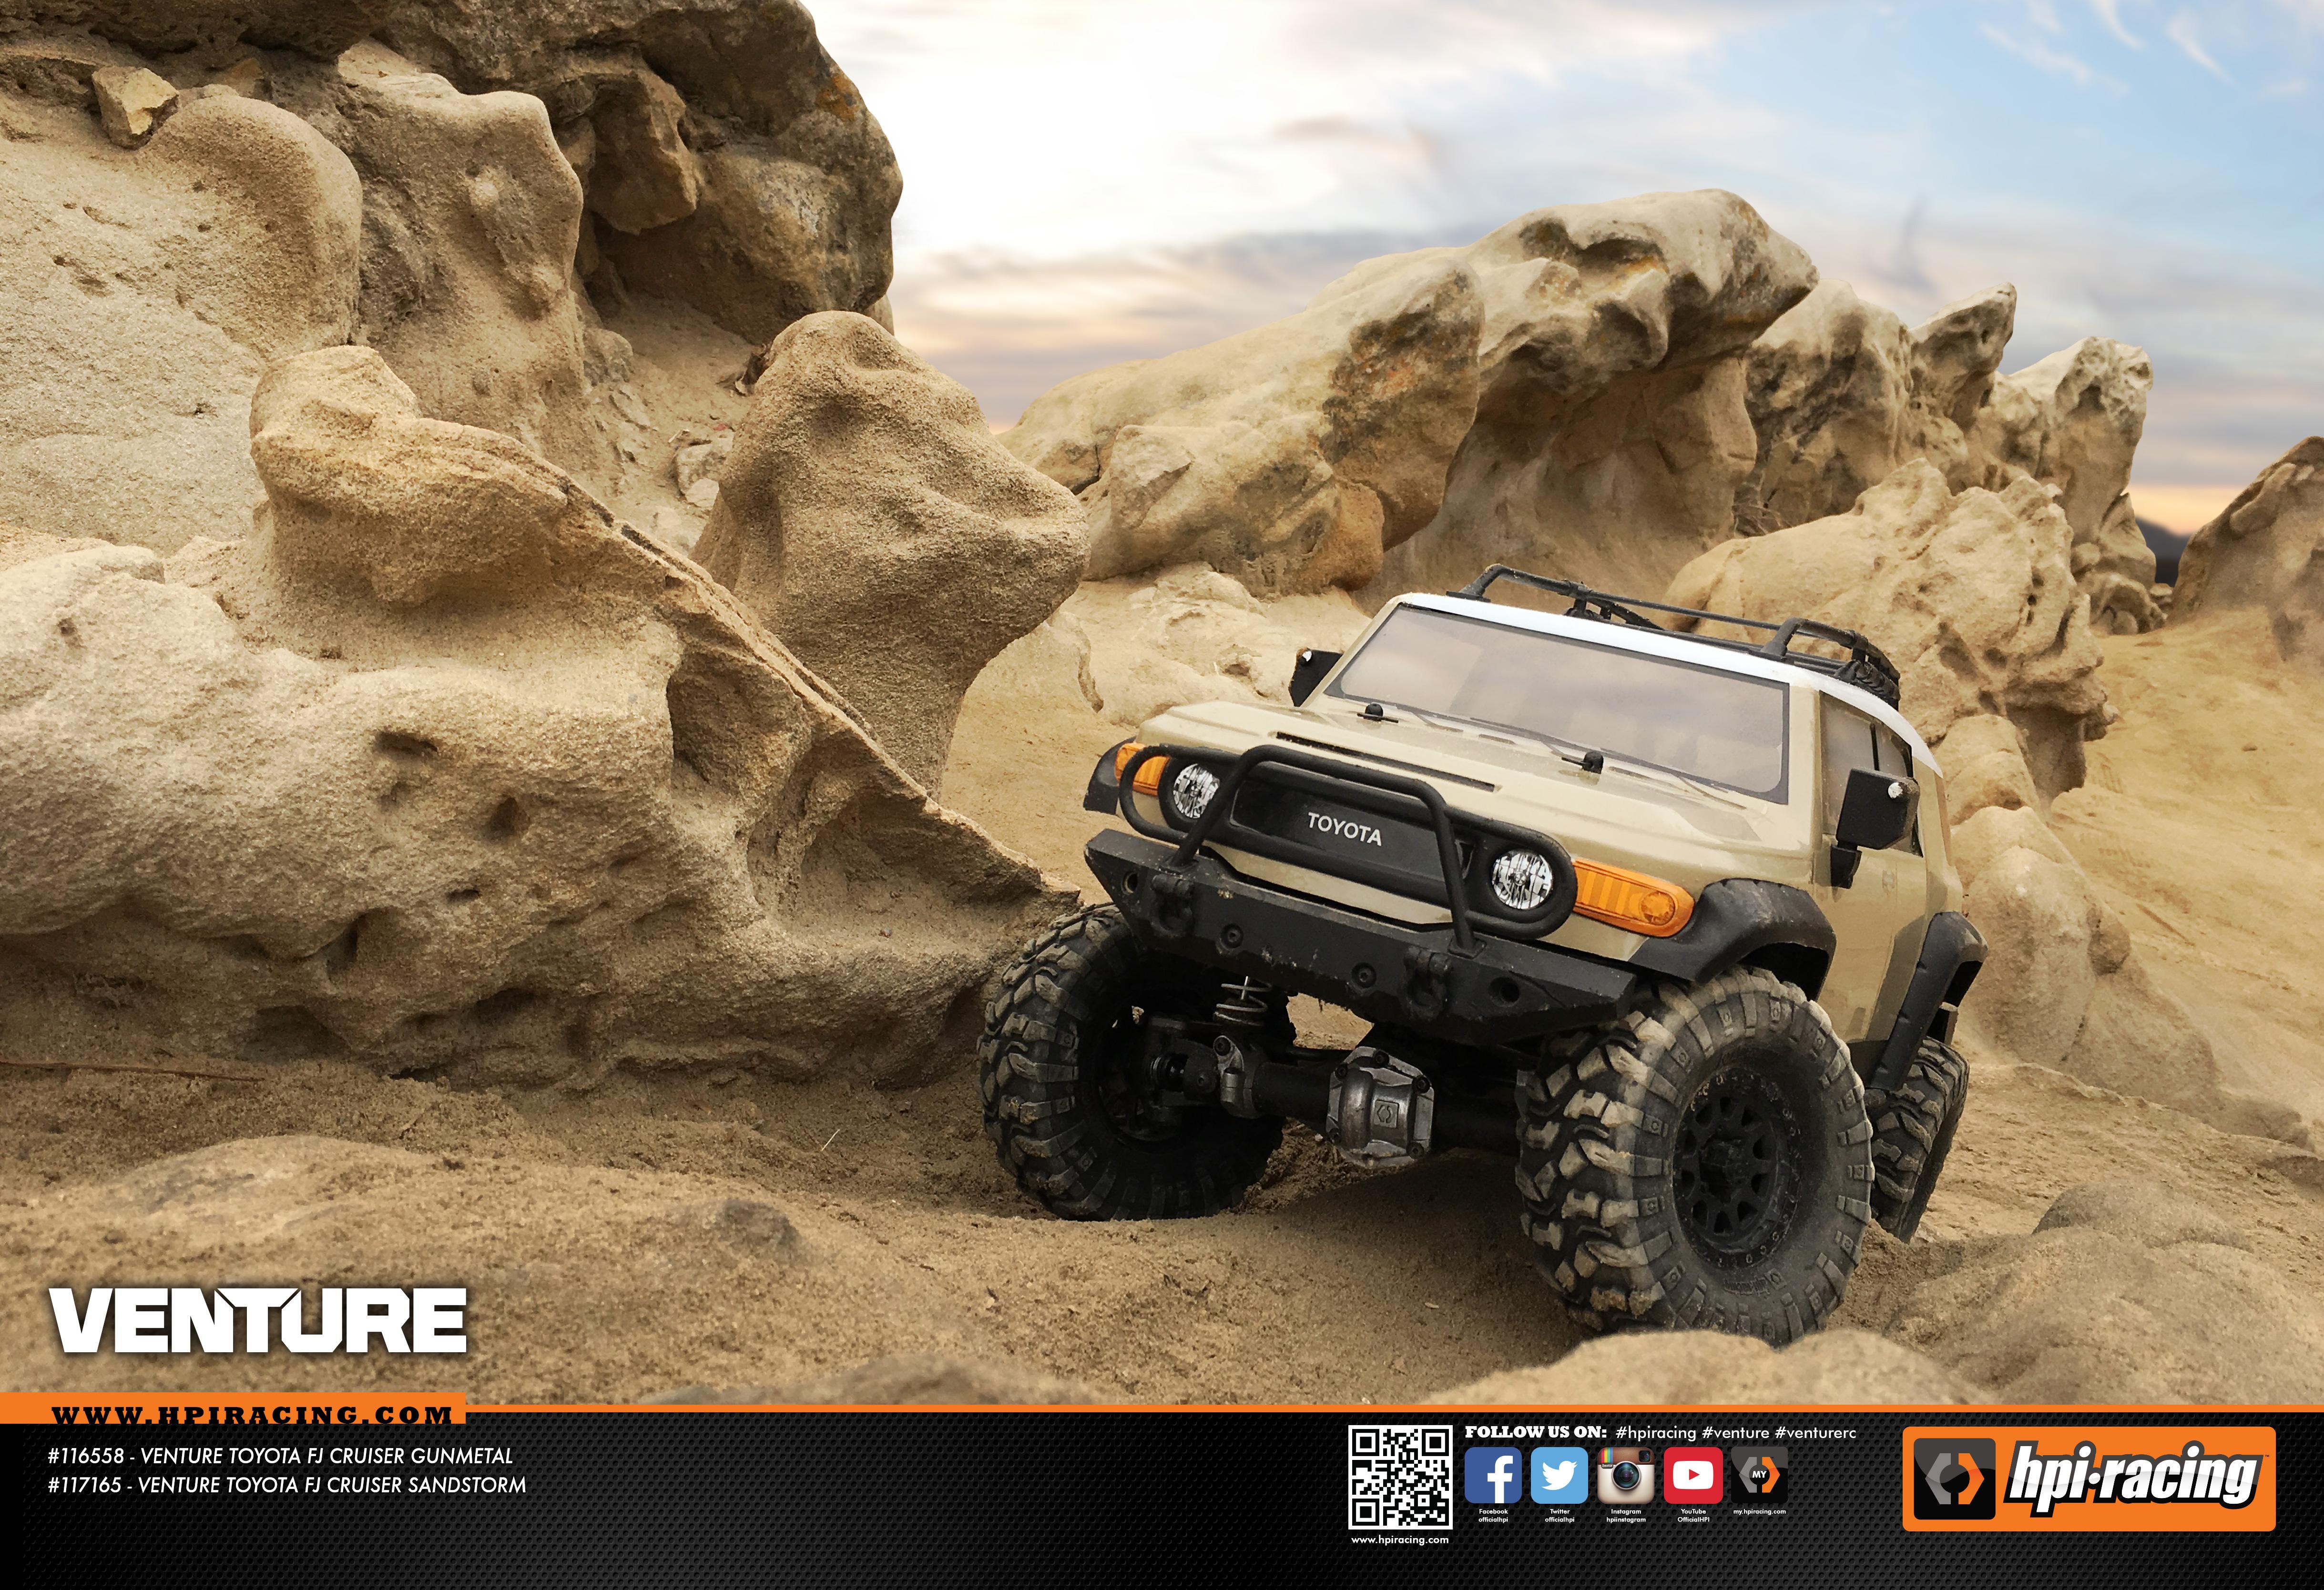 Venture FJ Cruiser Sandstorm Limestone Canyon